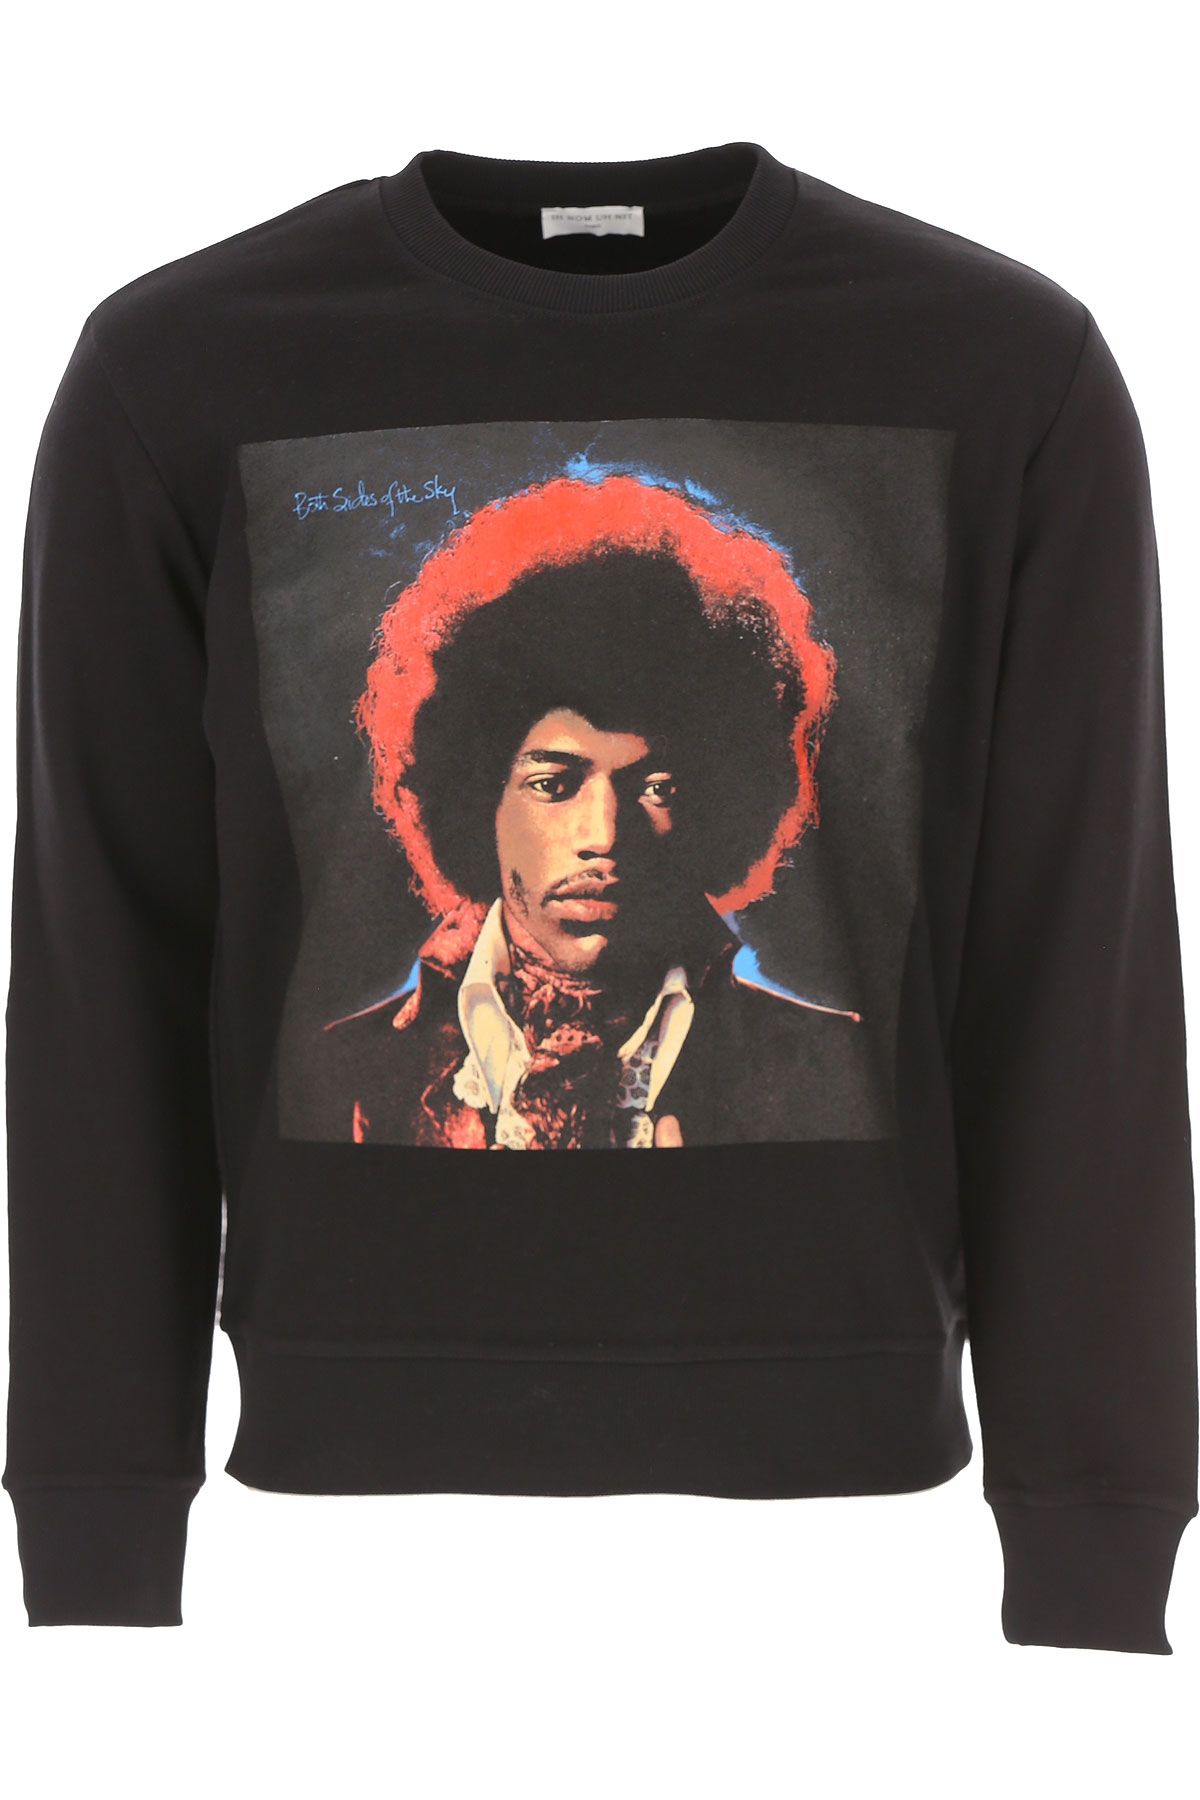 Ih Nom Uh Nit Sweatshirt for Men On Sale, Black, Cotton, 2019, L M S